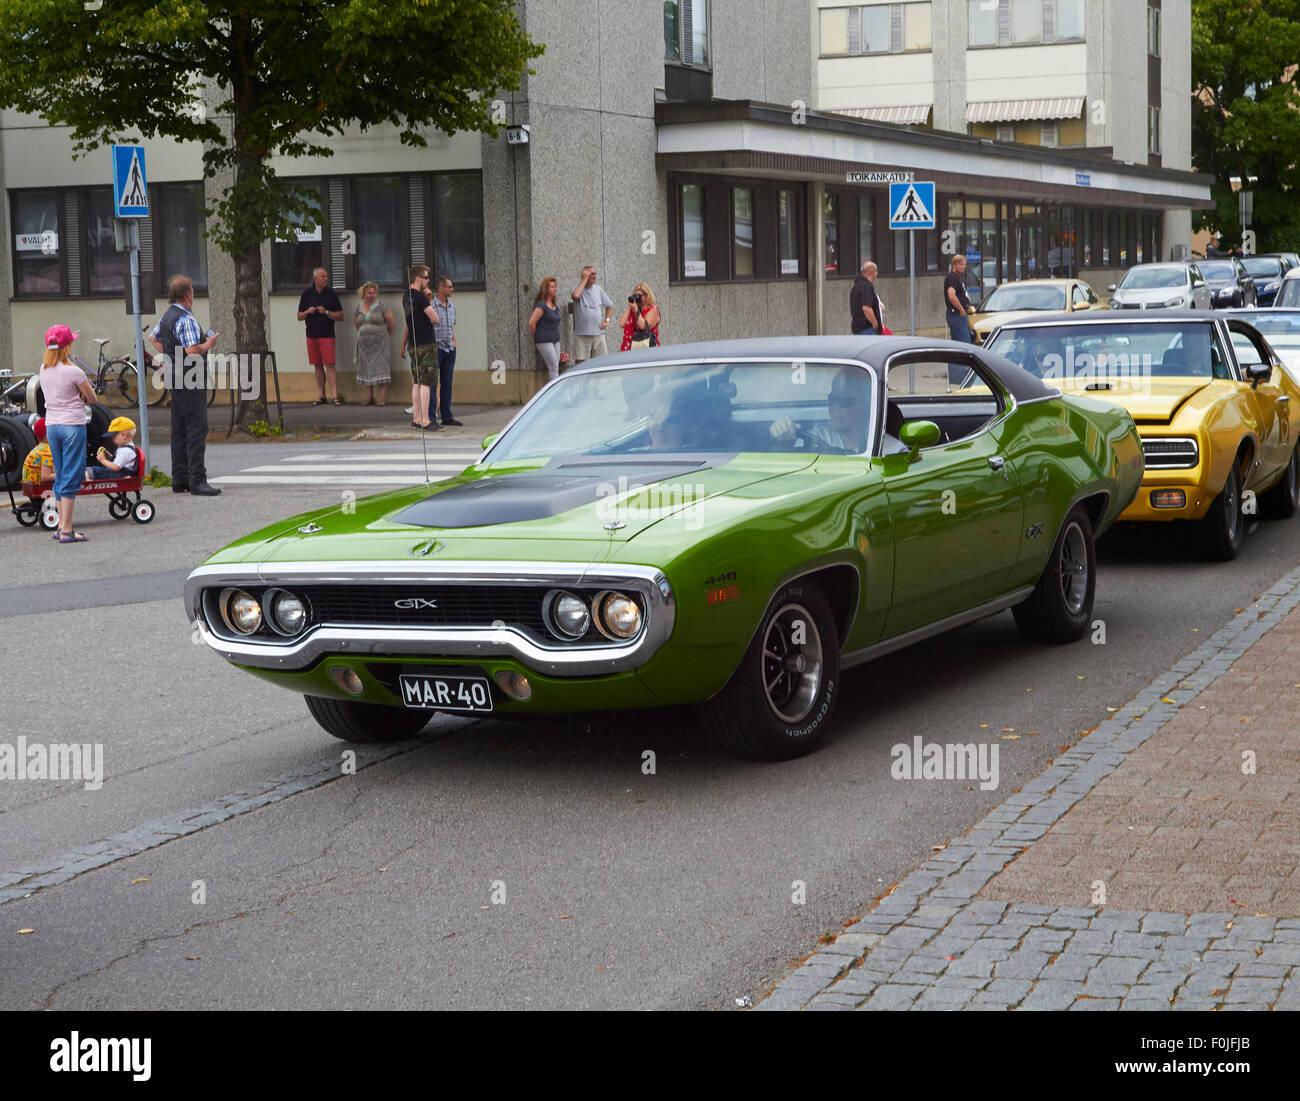 American cars in the Lappeenranta Cruising 2015, Finland - Stock Image